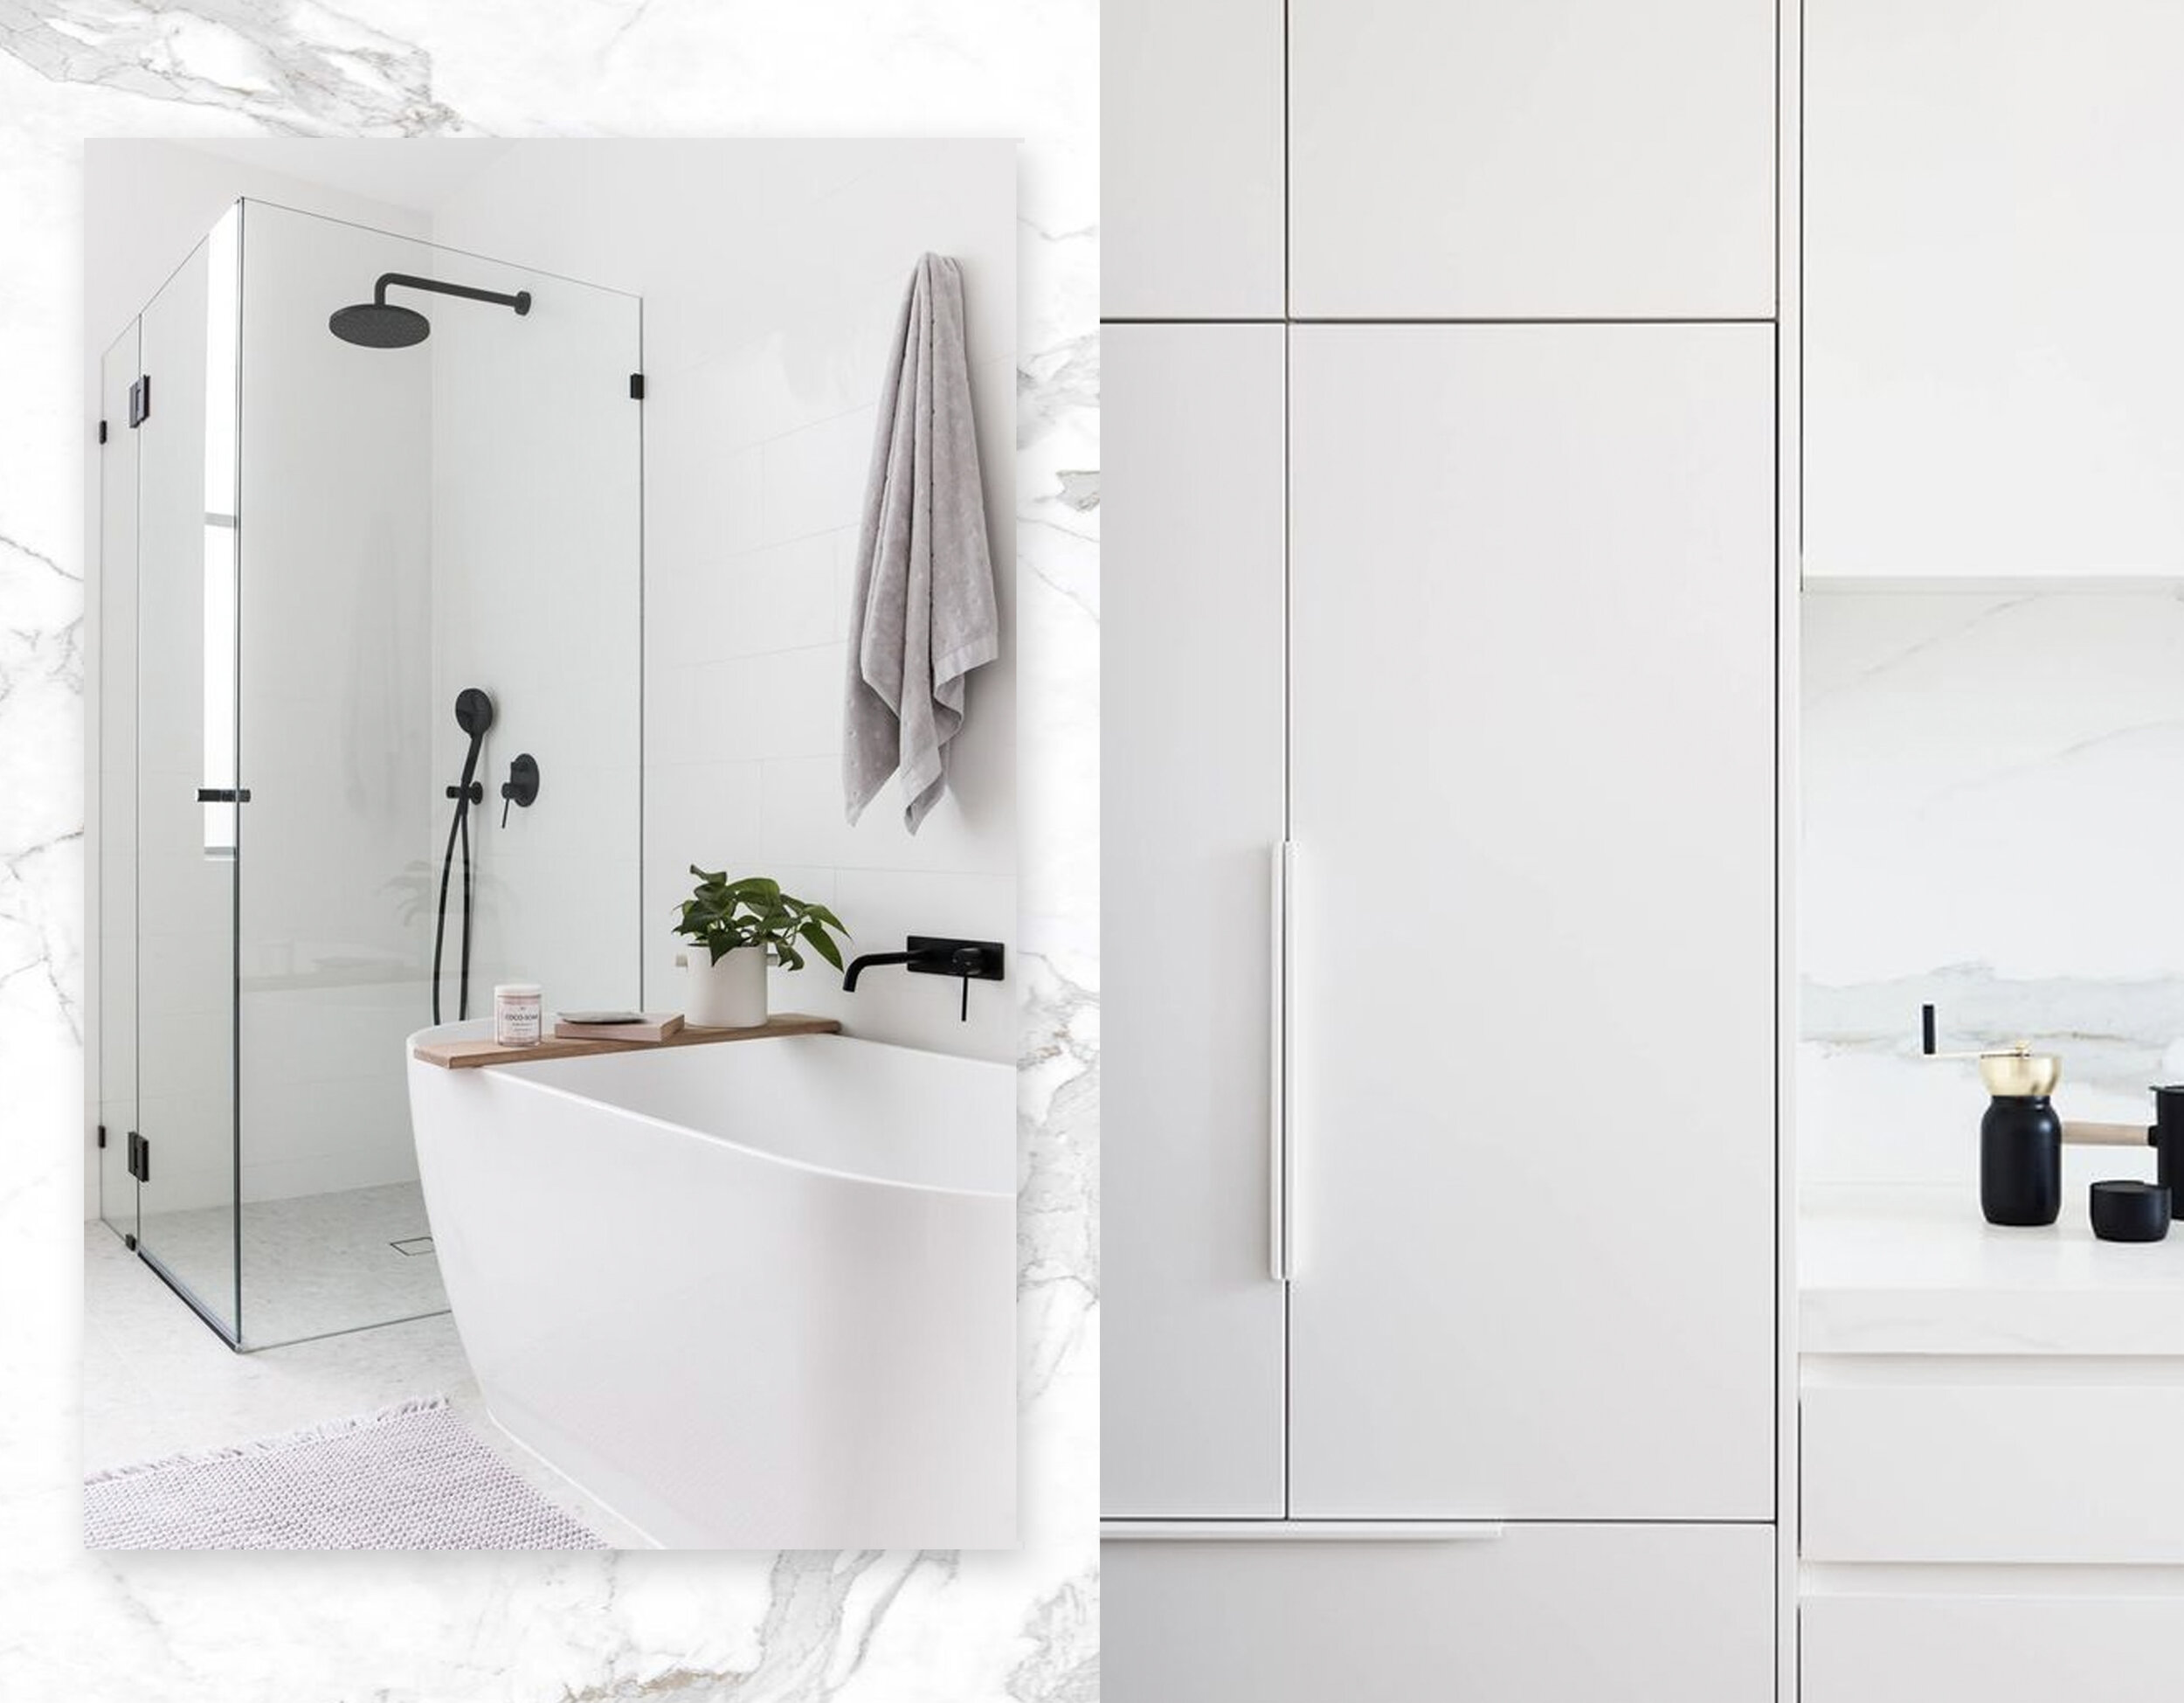 calacatta marble via  Architonic  - bathroom - kitchen via  Est Living